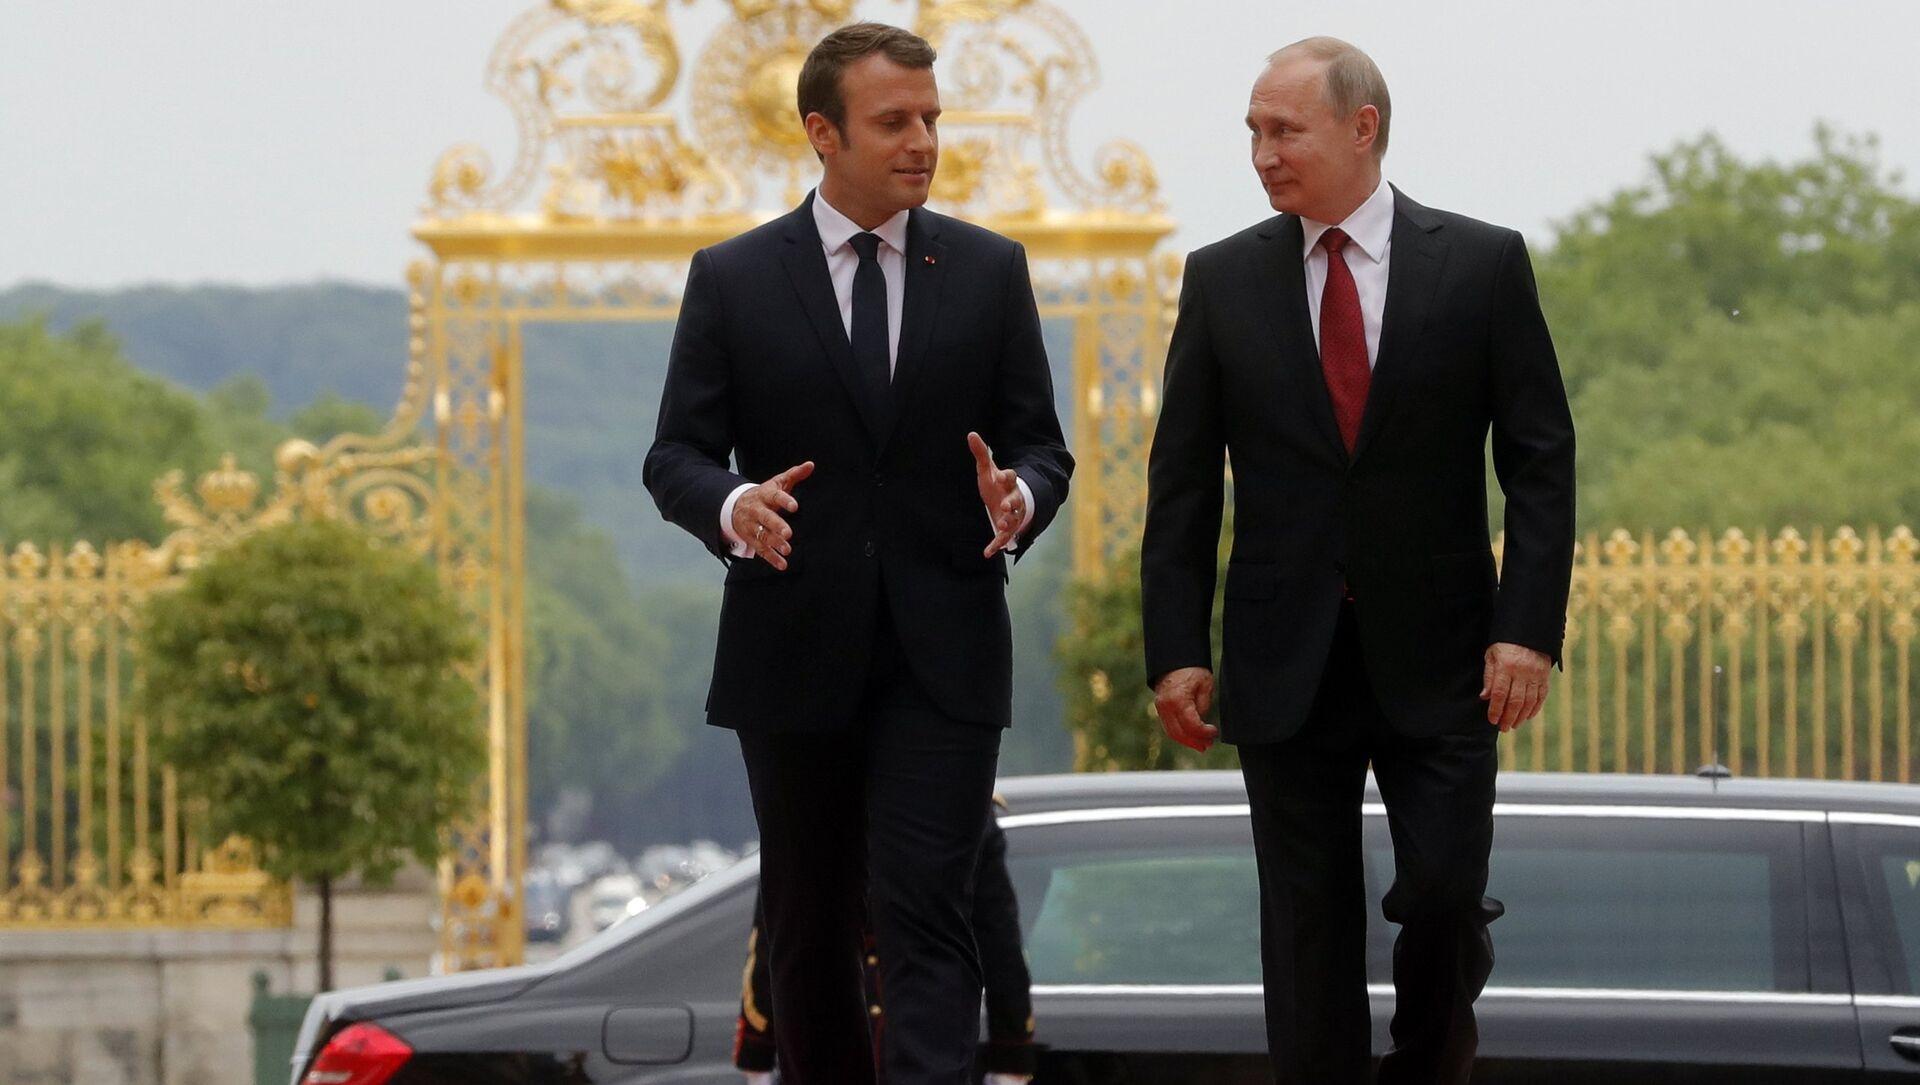 Emmanuel Macron et Vladimir Poutine - Sputnik France, 1920, 24.06.2021